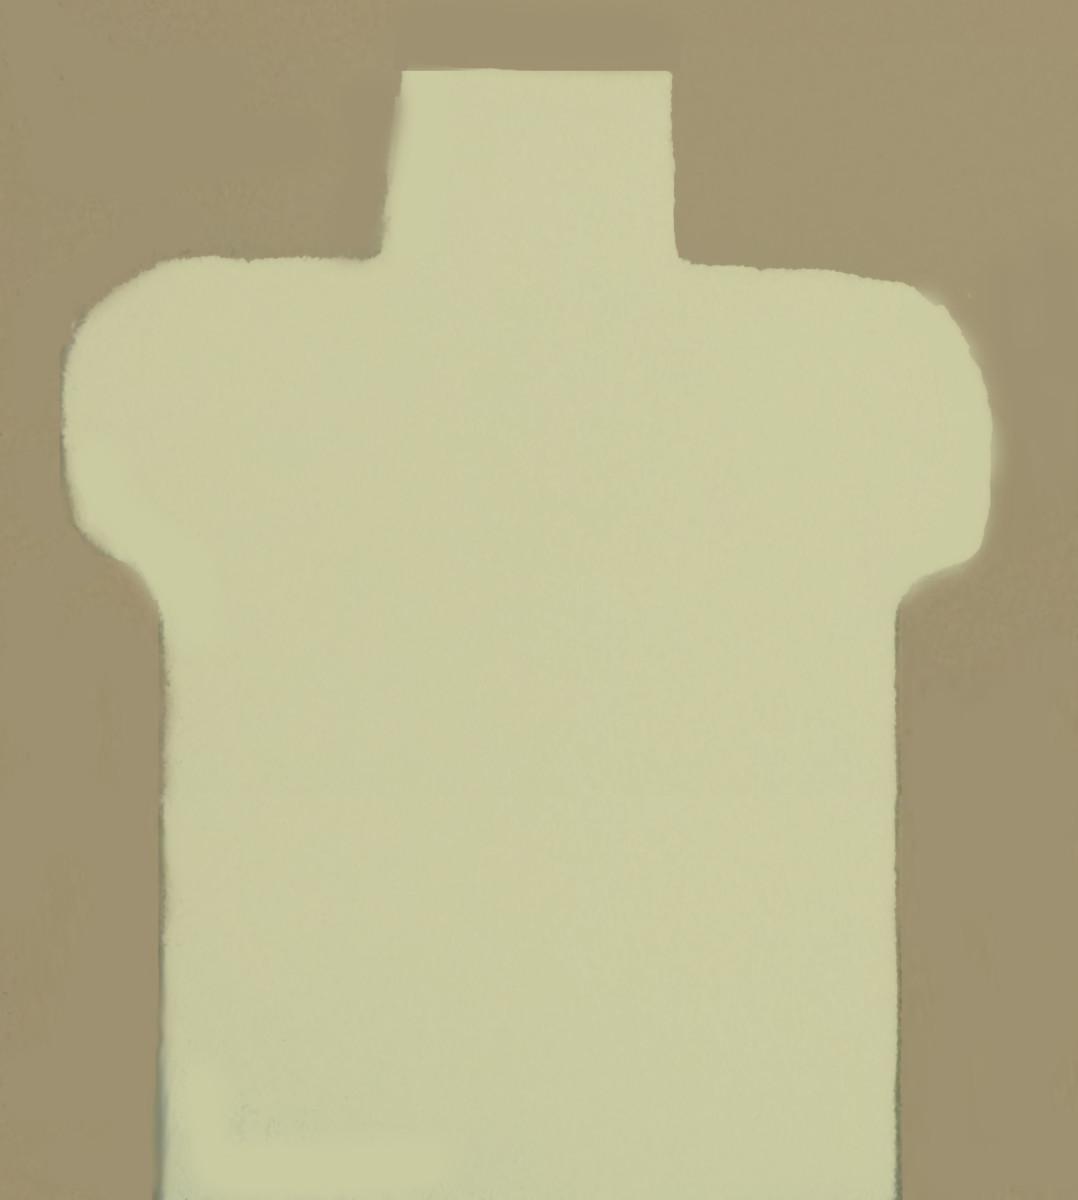 Iron Faster: Make A Custom Ironing Board Shape